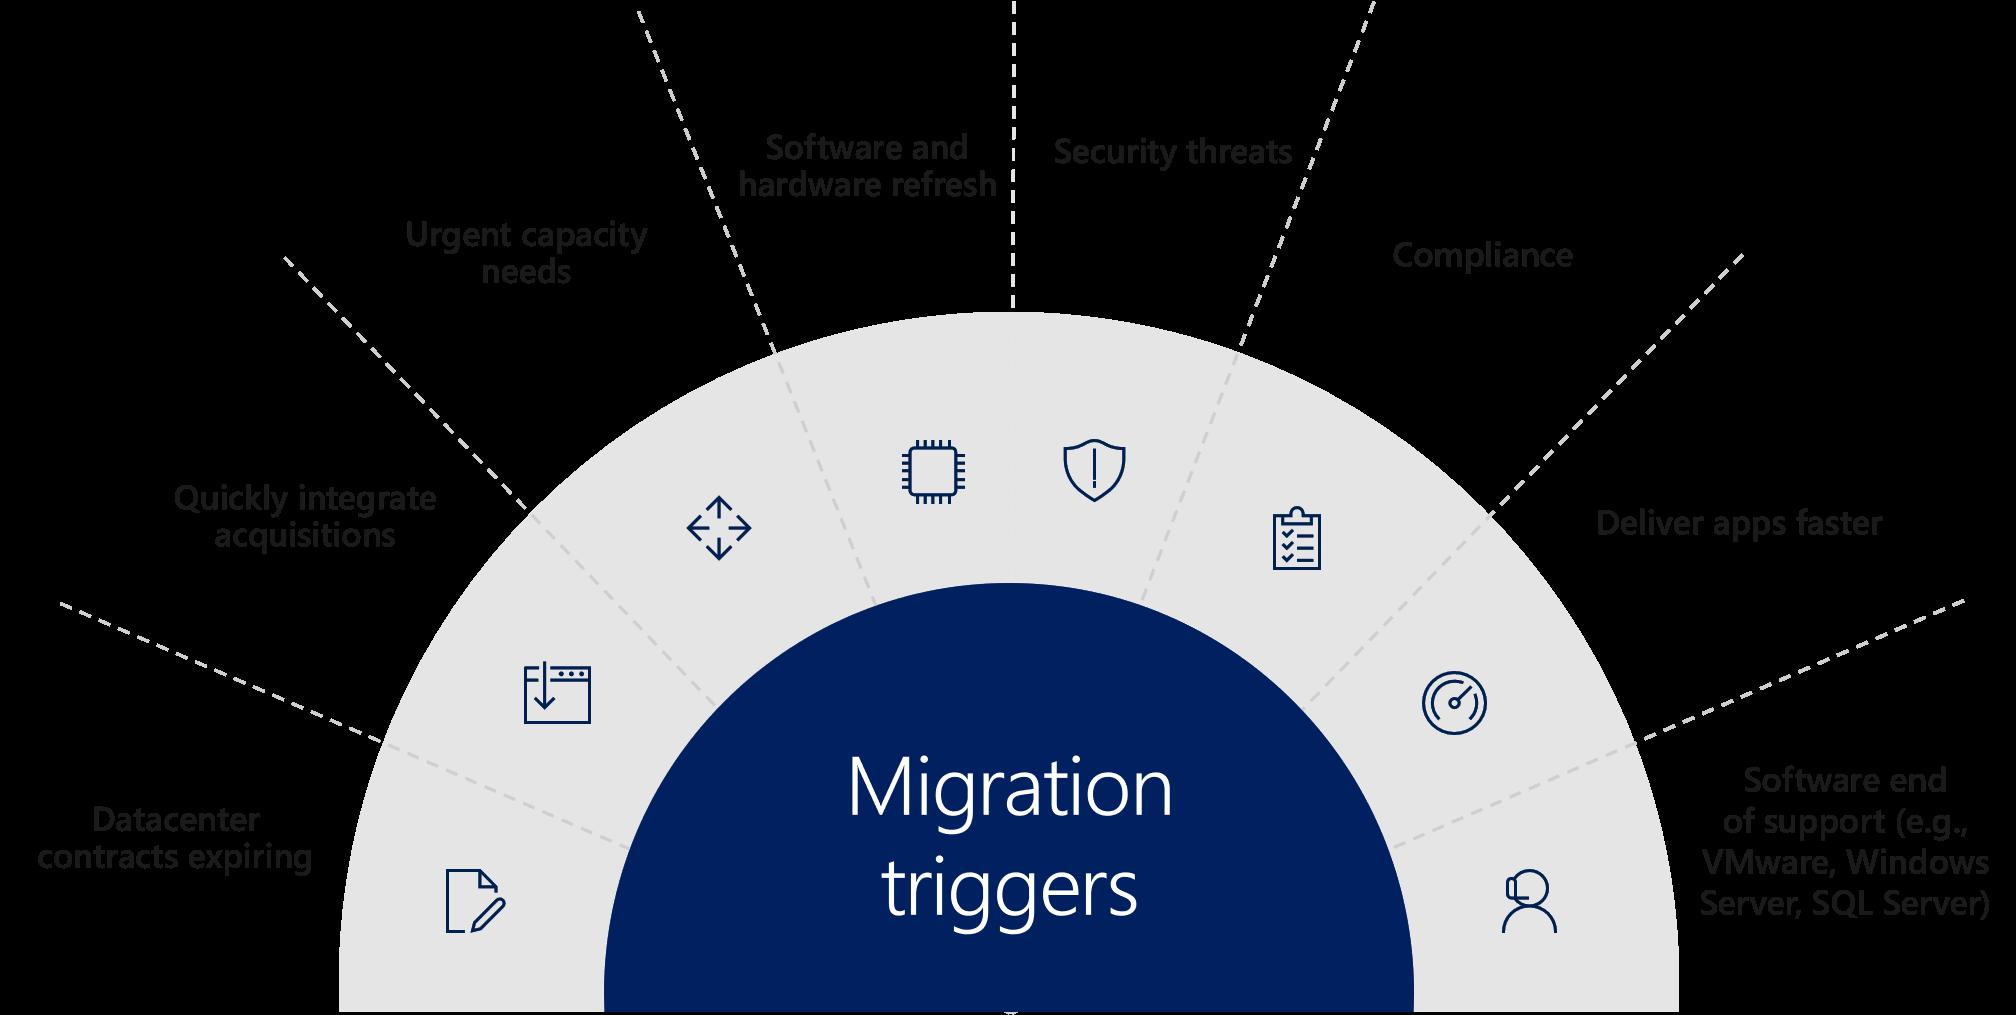 azure migration triggers